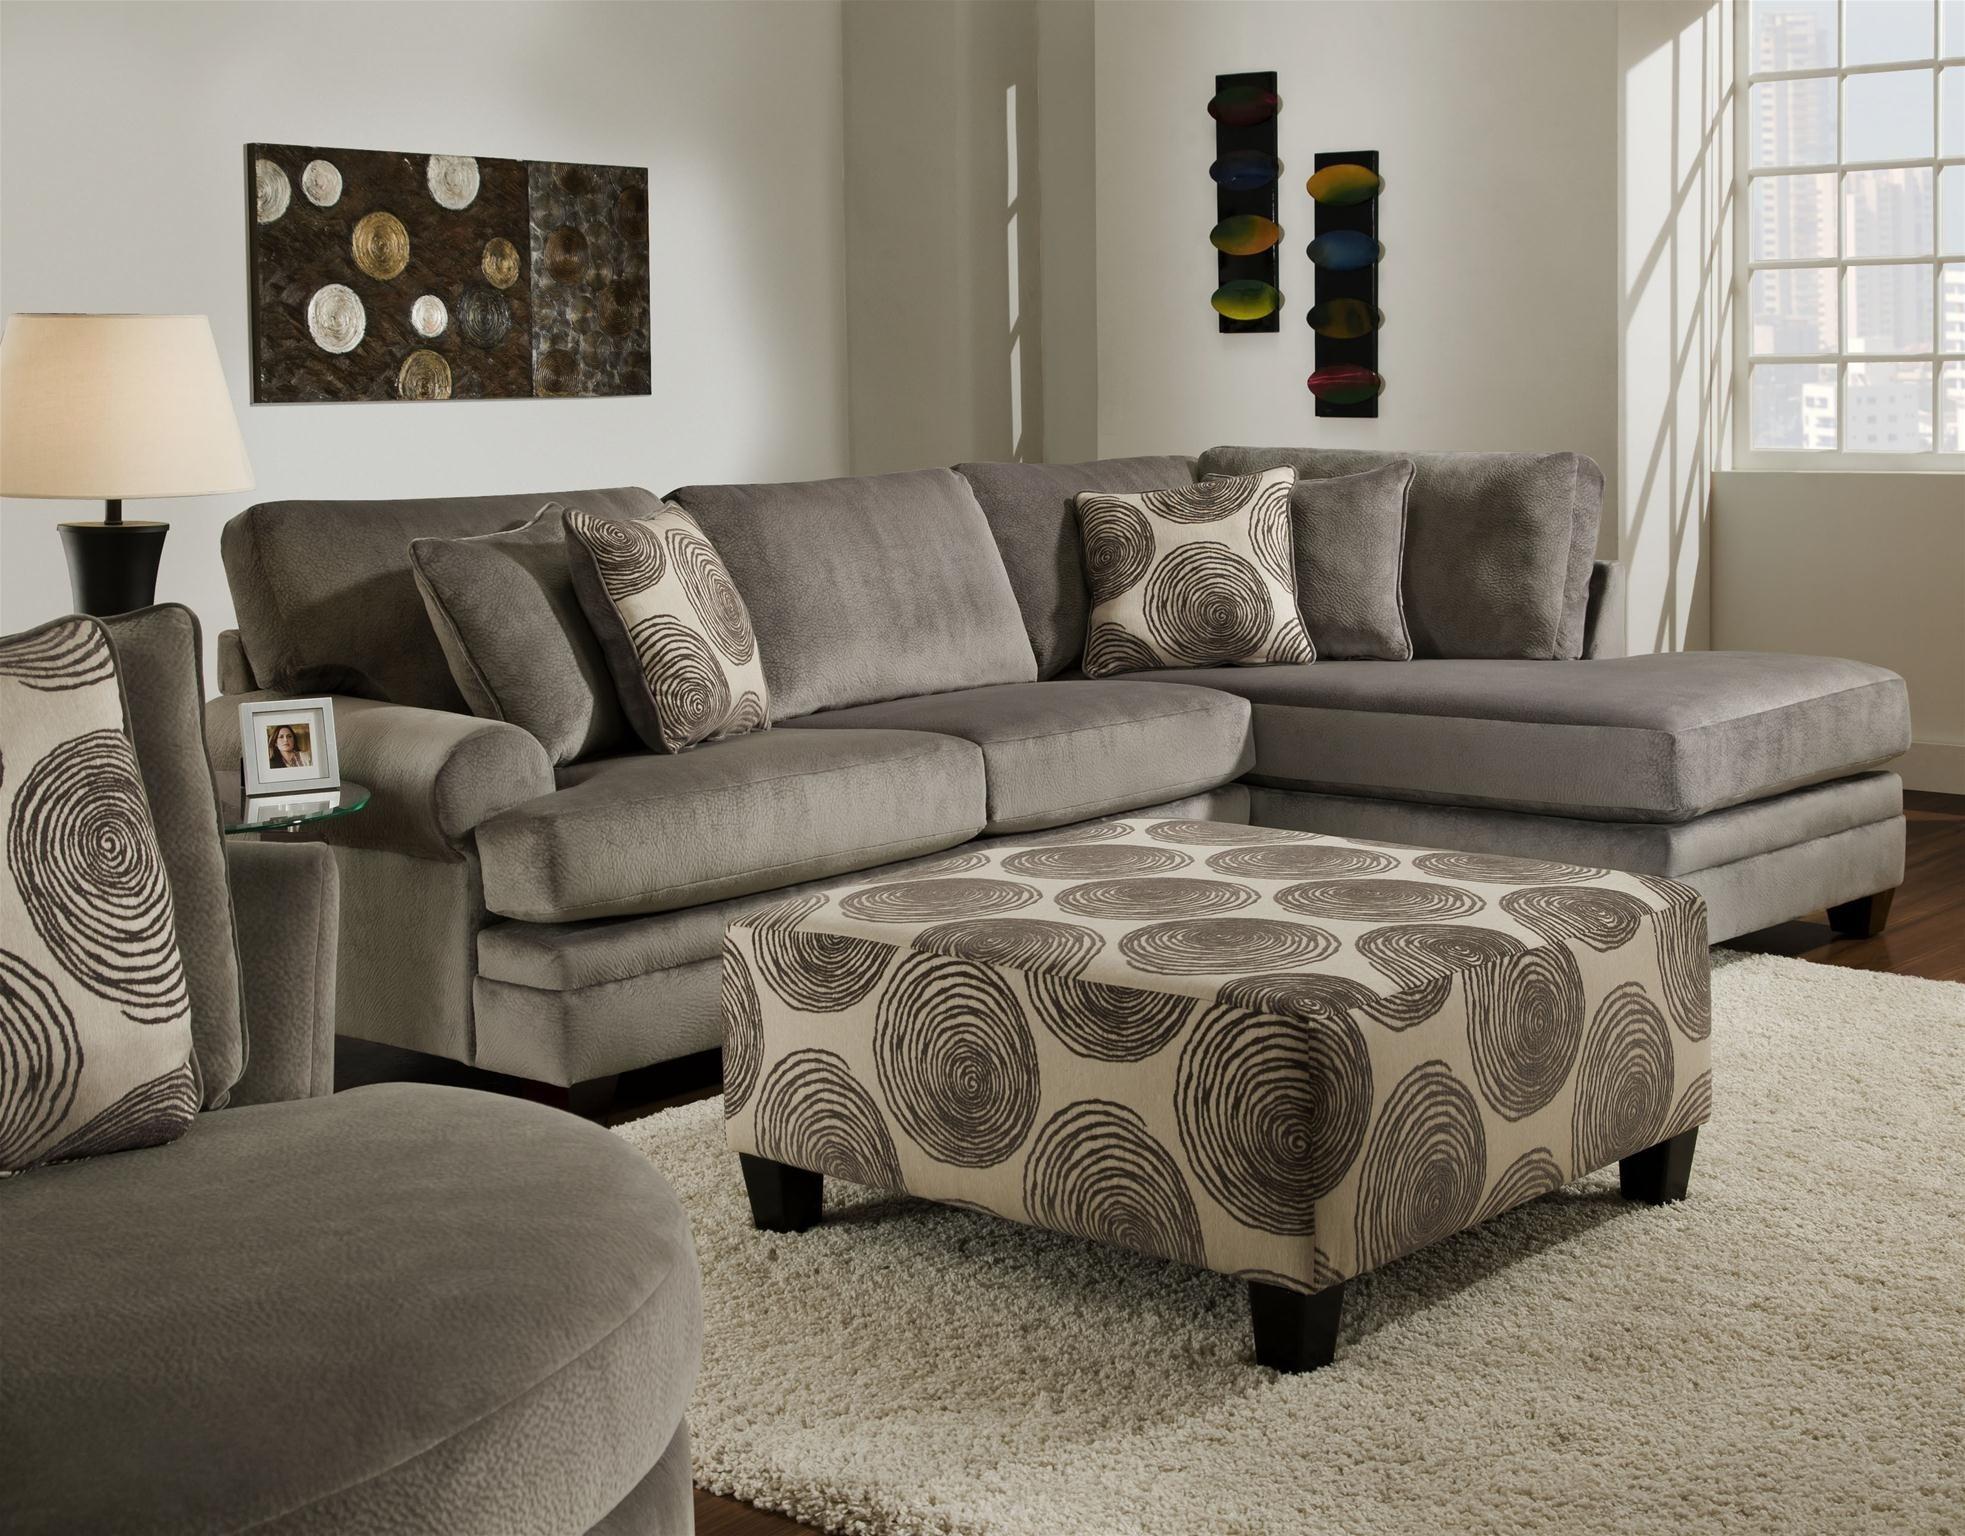 Albany Living Room SWIVEL CHAIR SMOKE 8642 27 At Feceras Furniture U0026  Mattress